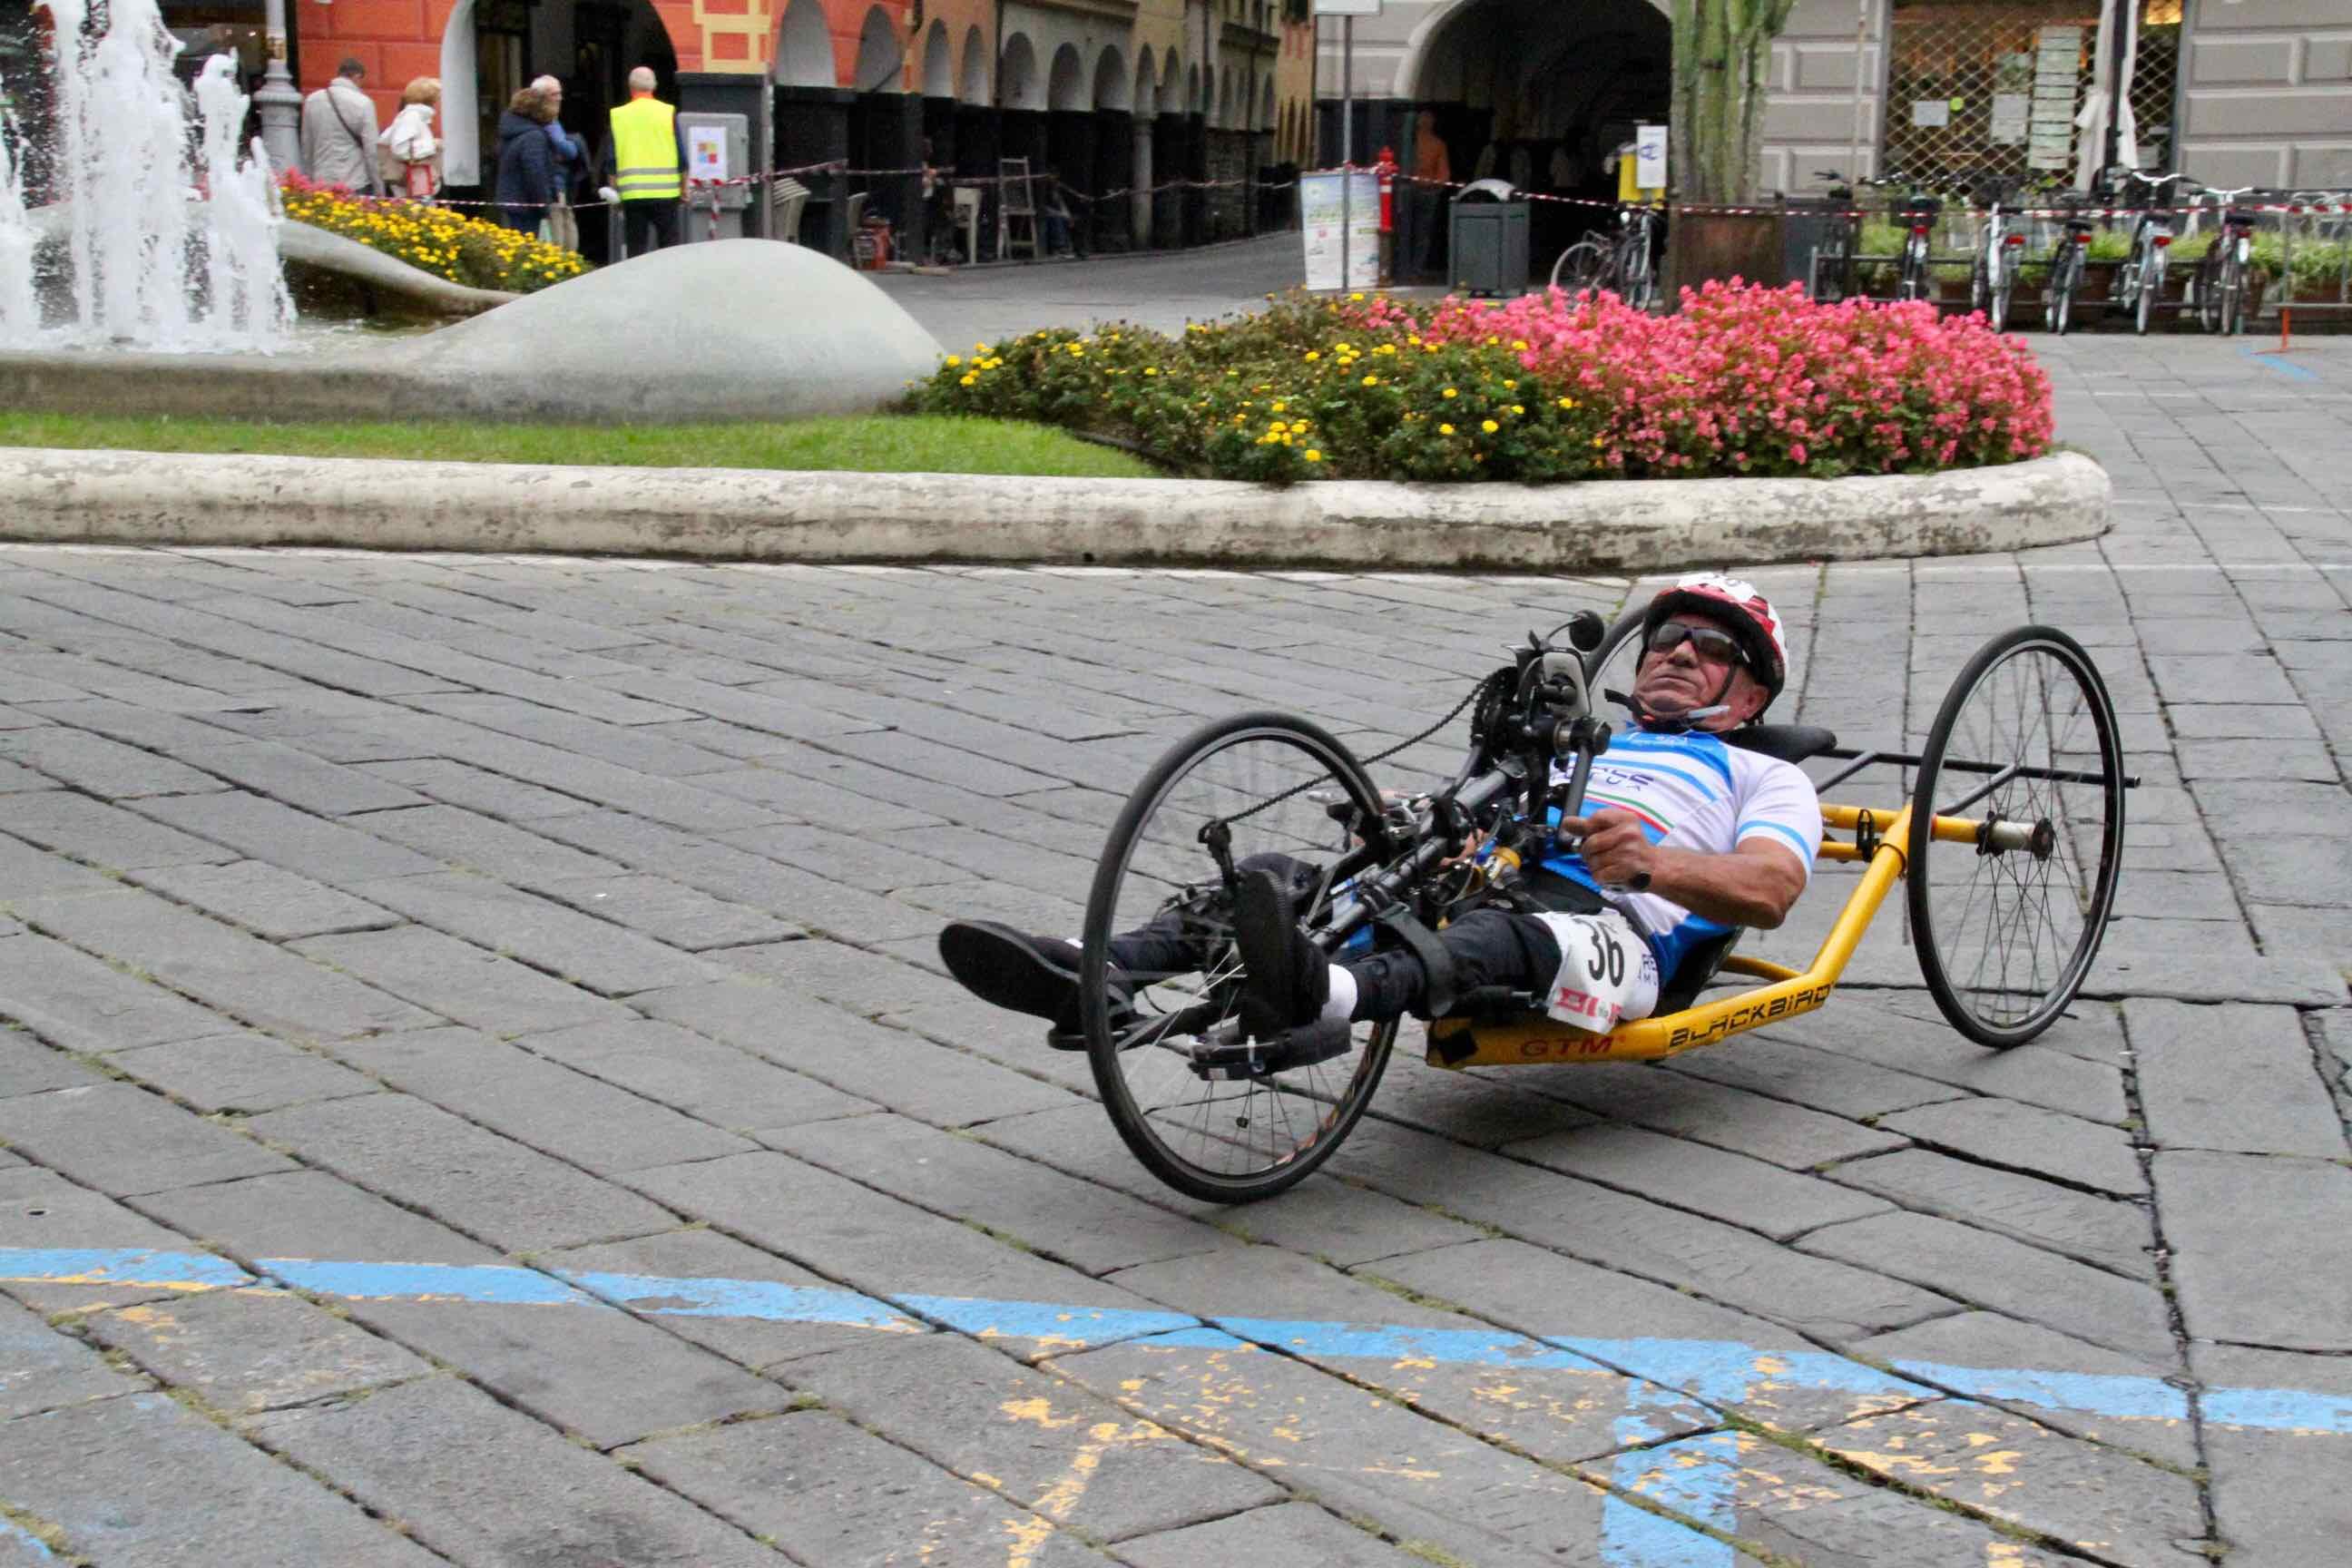 1° Memorial don Nando Negri a Chiavari per il Giro d'Italia Handbike 2018 - 4